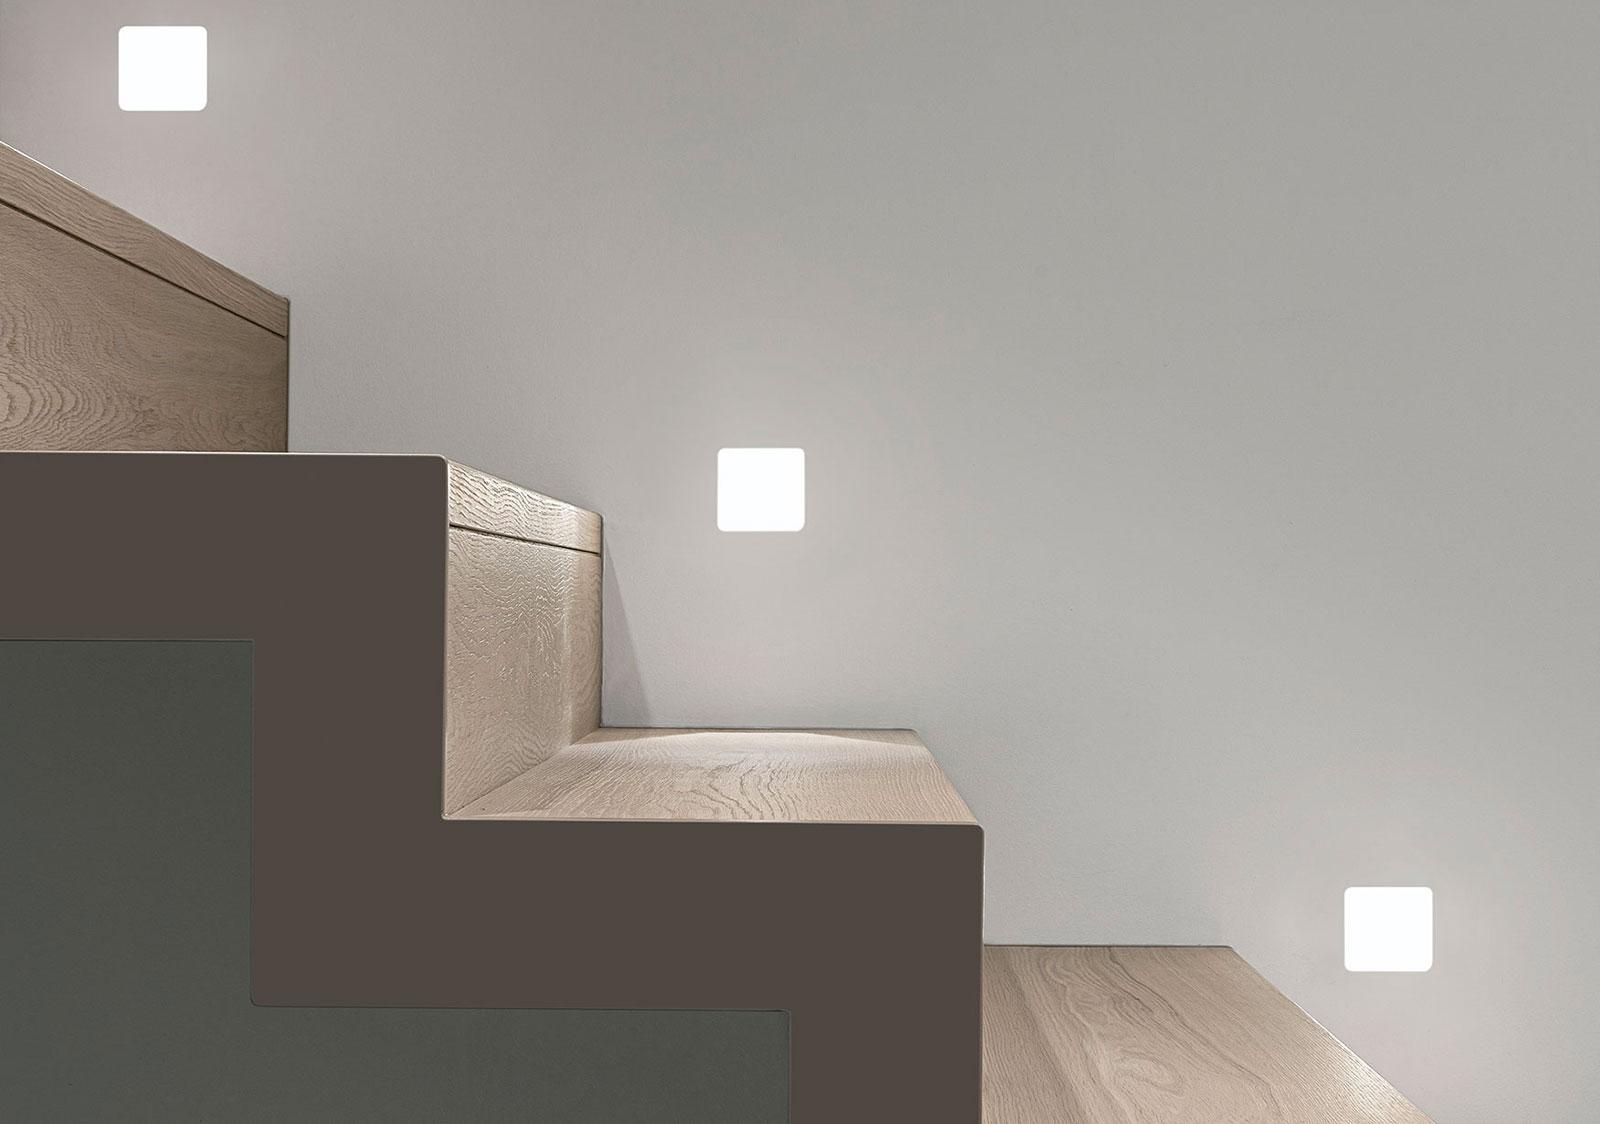 diffused light architecture - photo #14